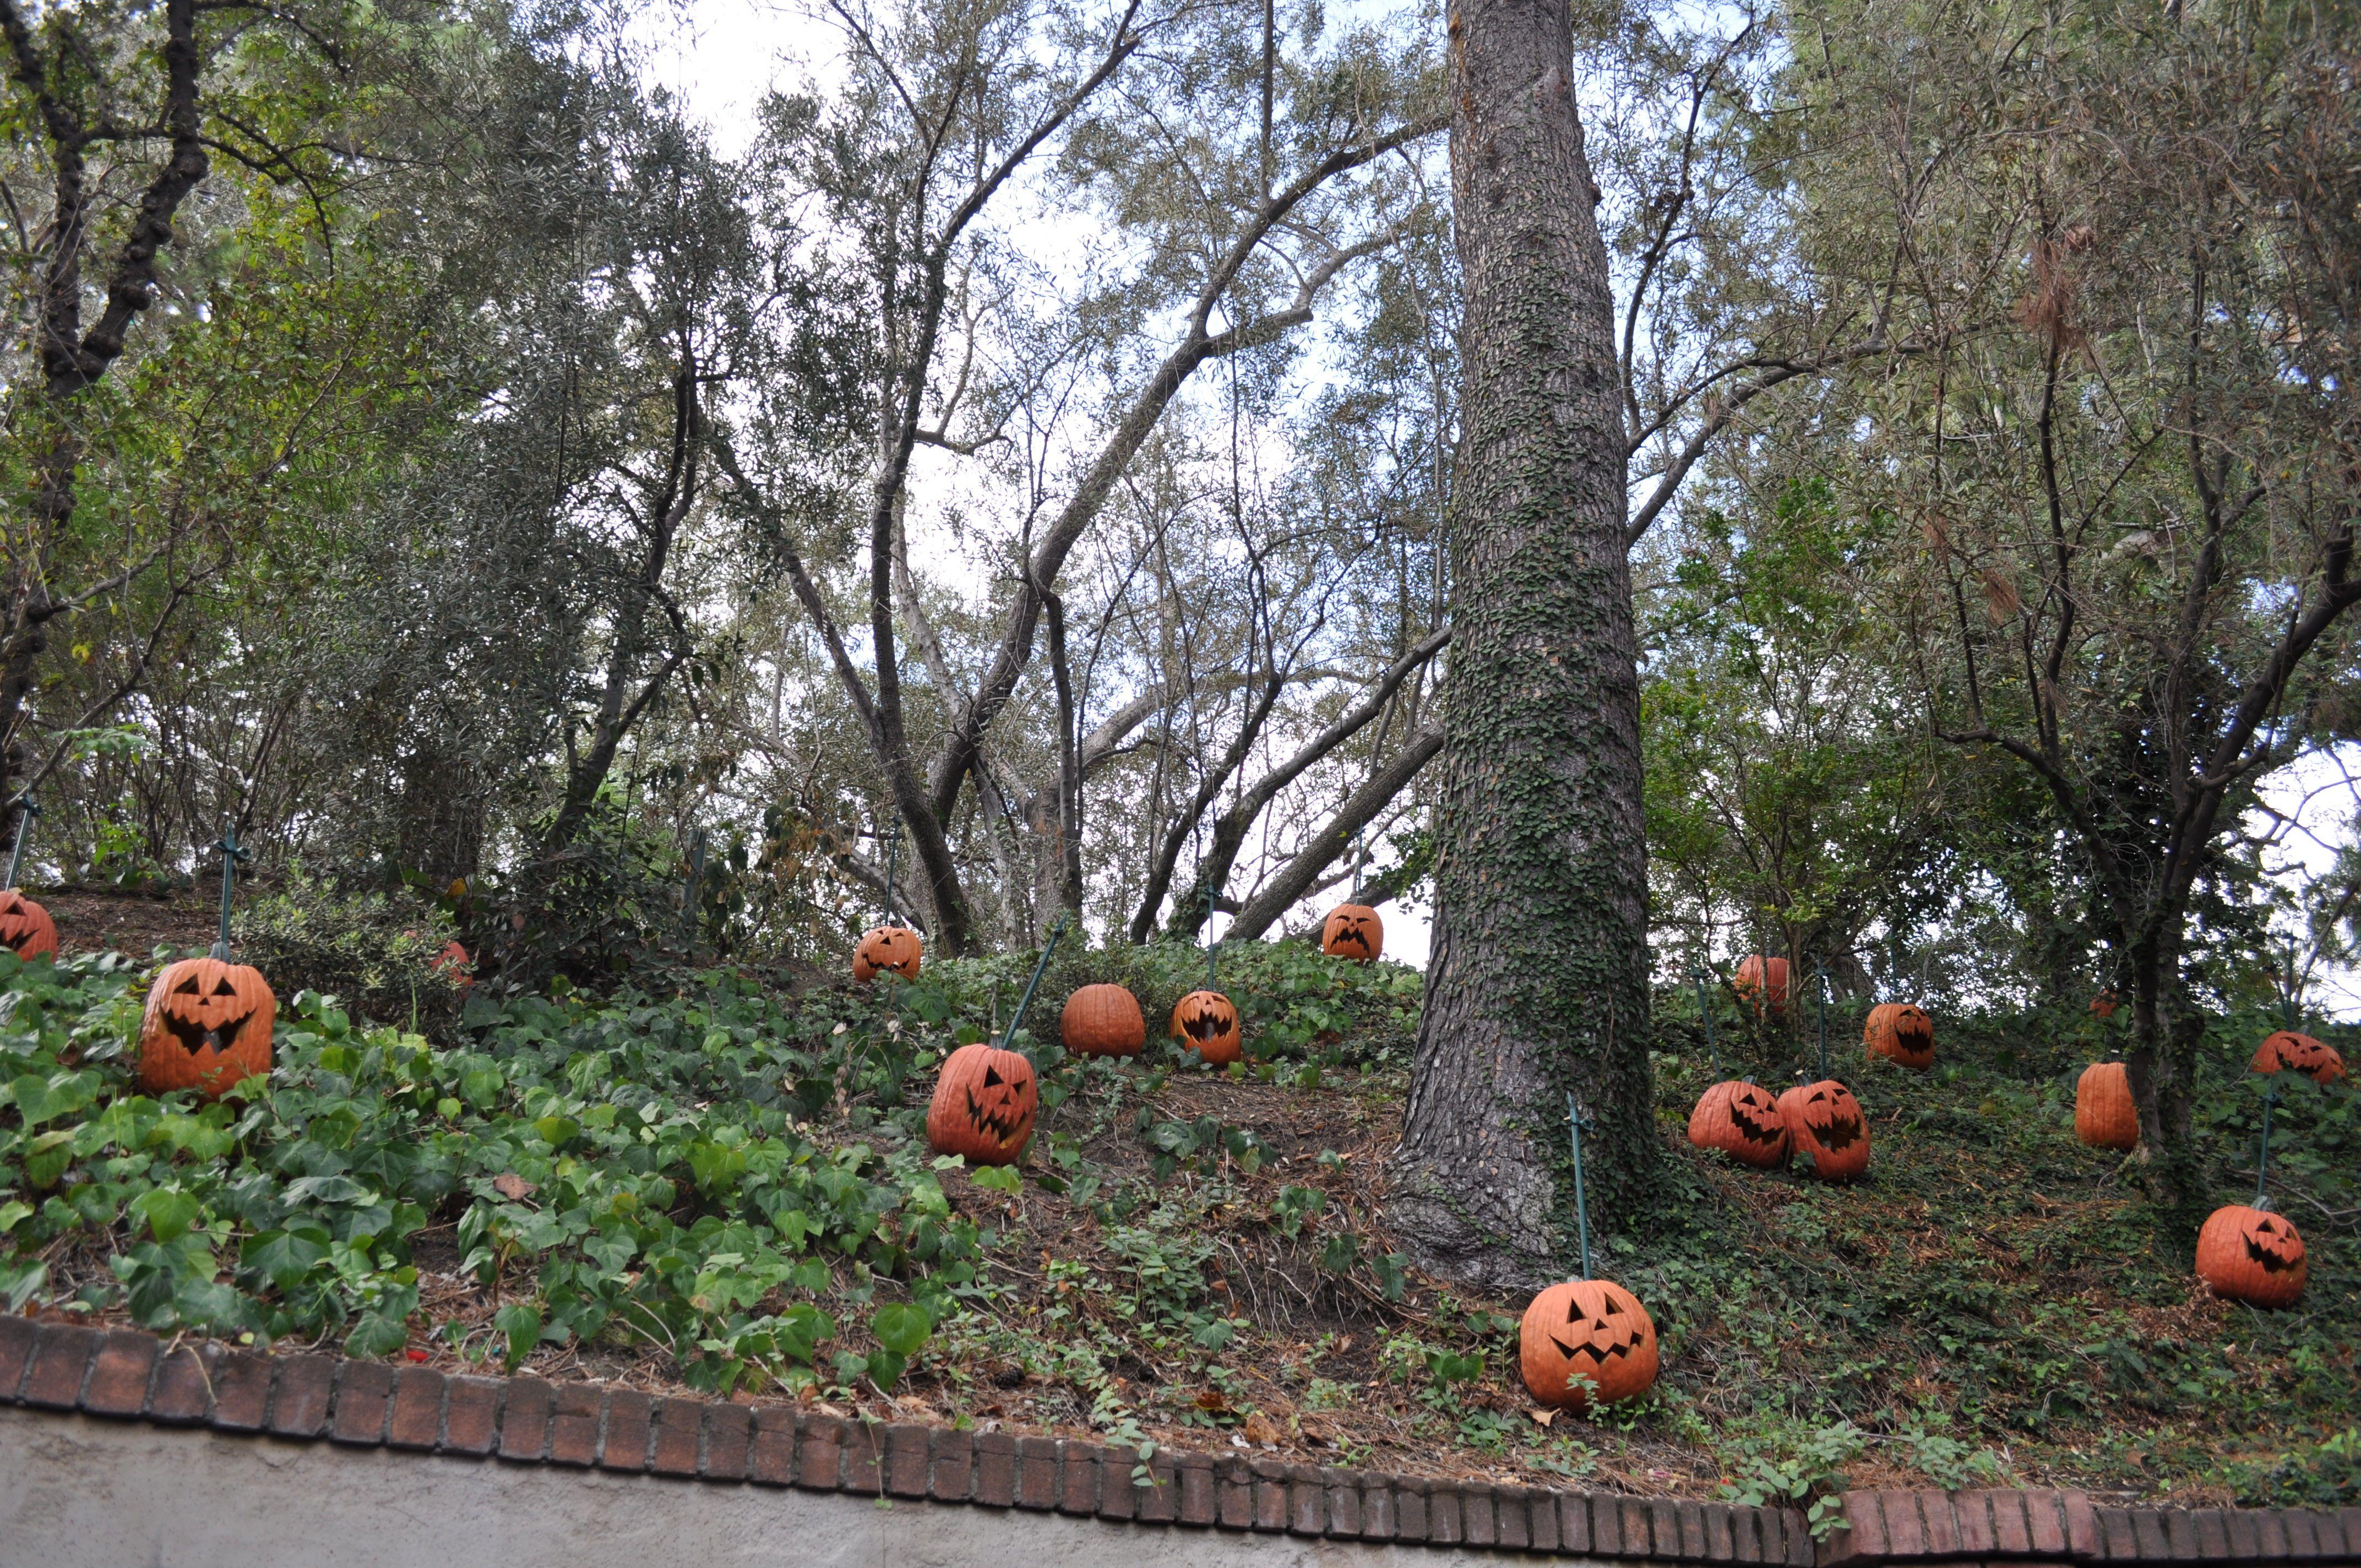 Disneys Haunted Mansion Yard  Halloween decorations  Pinterest